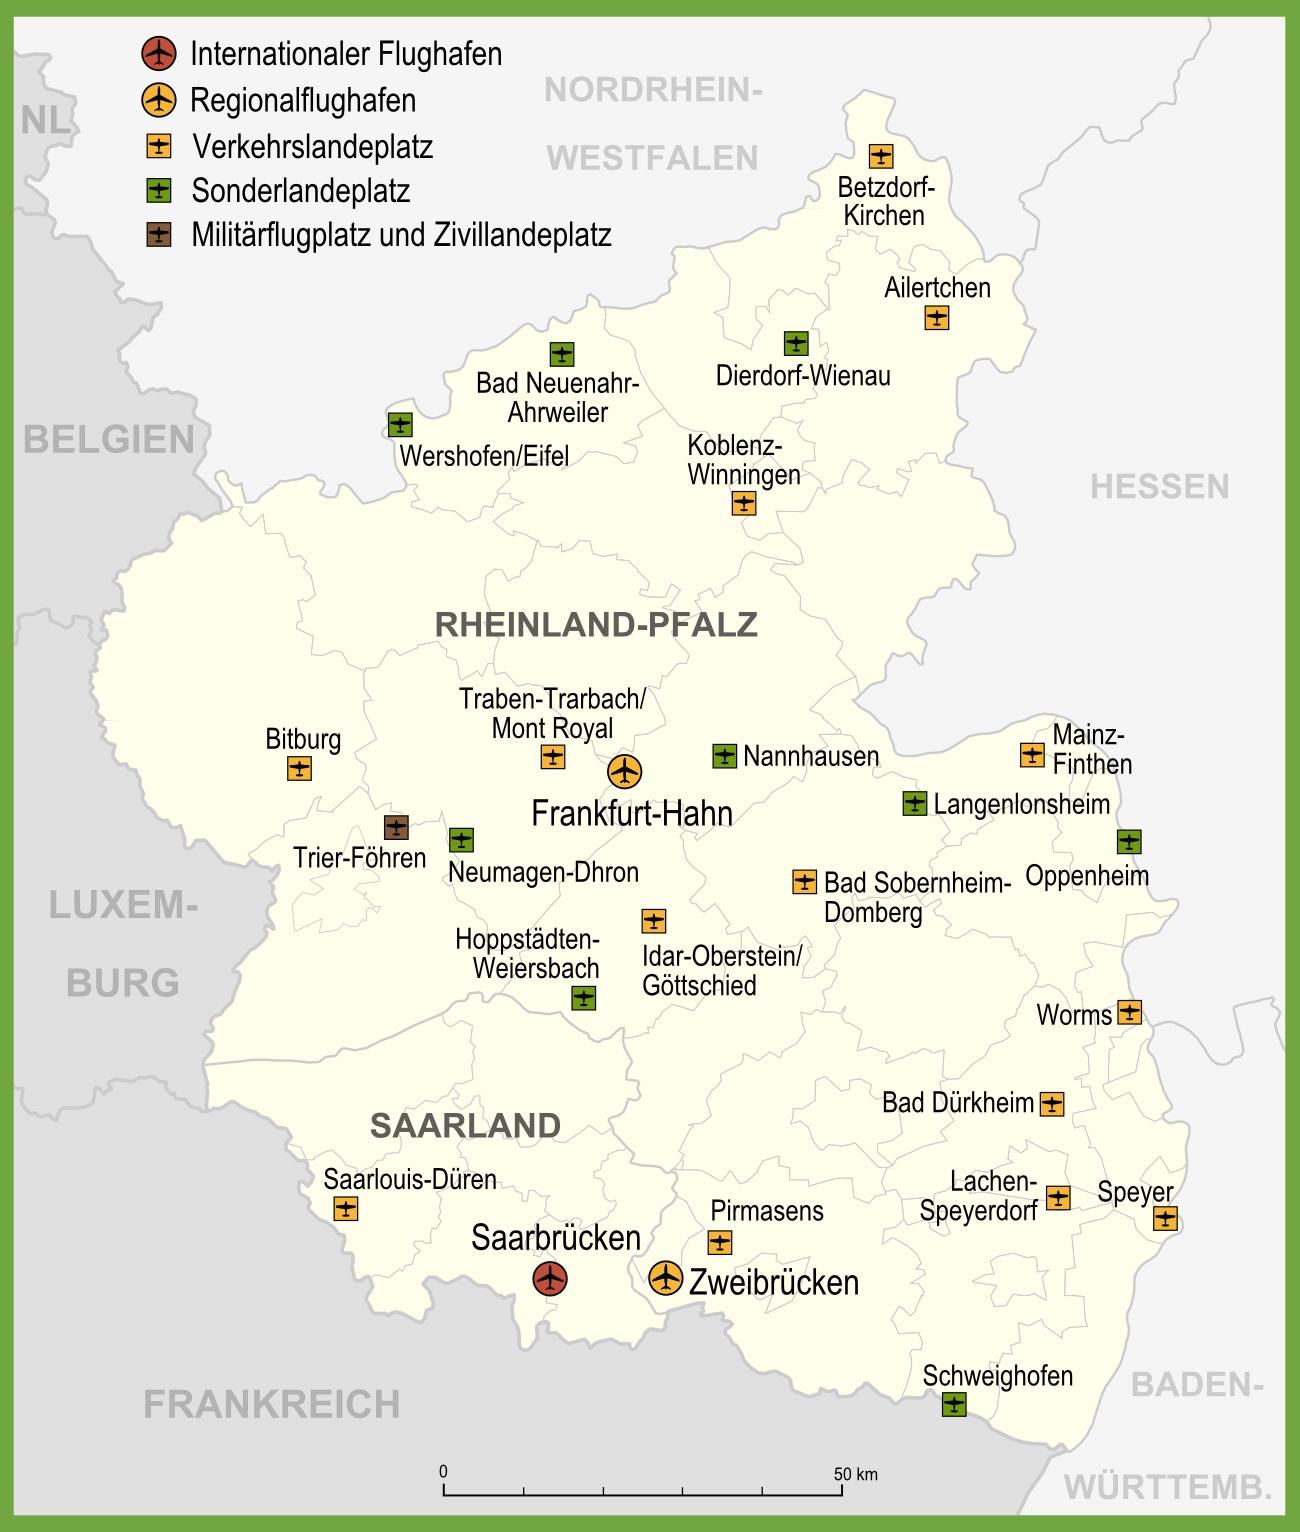 Map of airports in RhinelandPalatinate